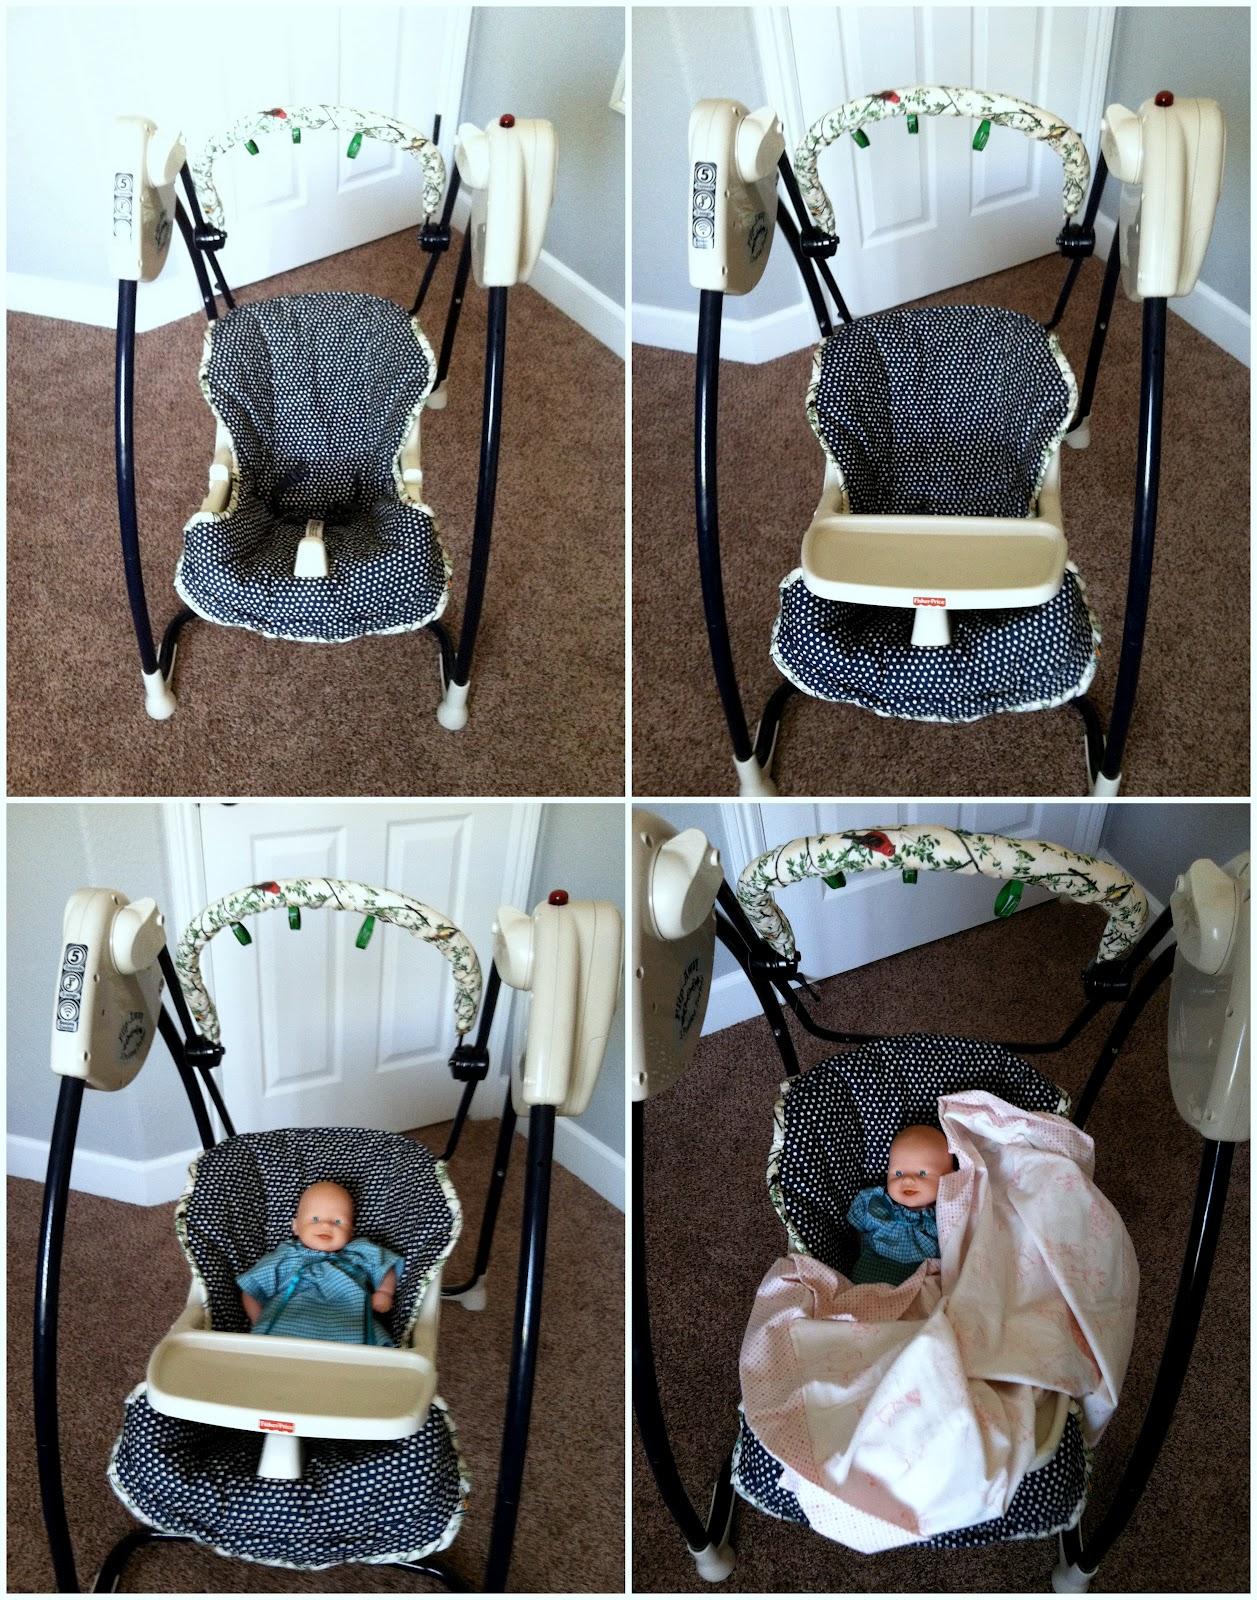 Getz Blogging Diy Baby Swing Seat Cover